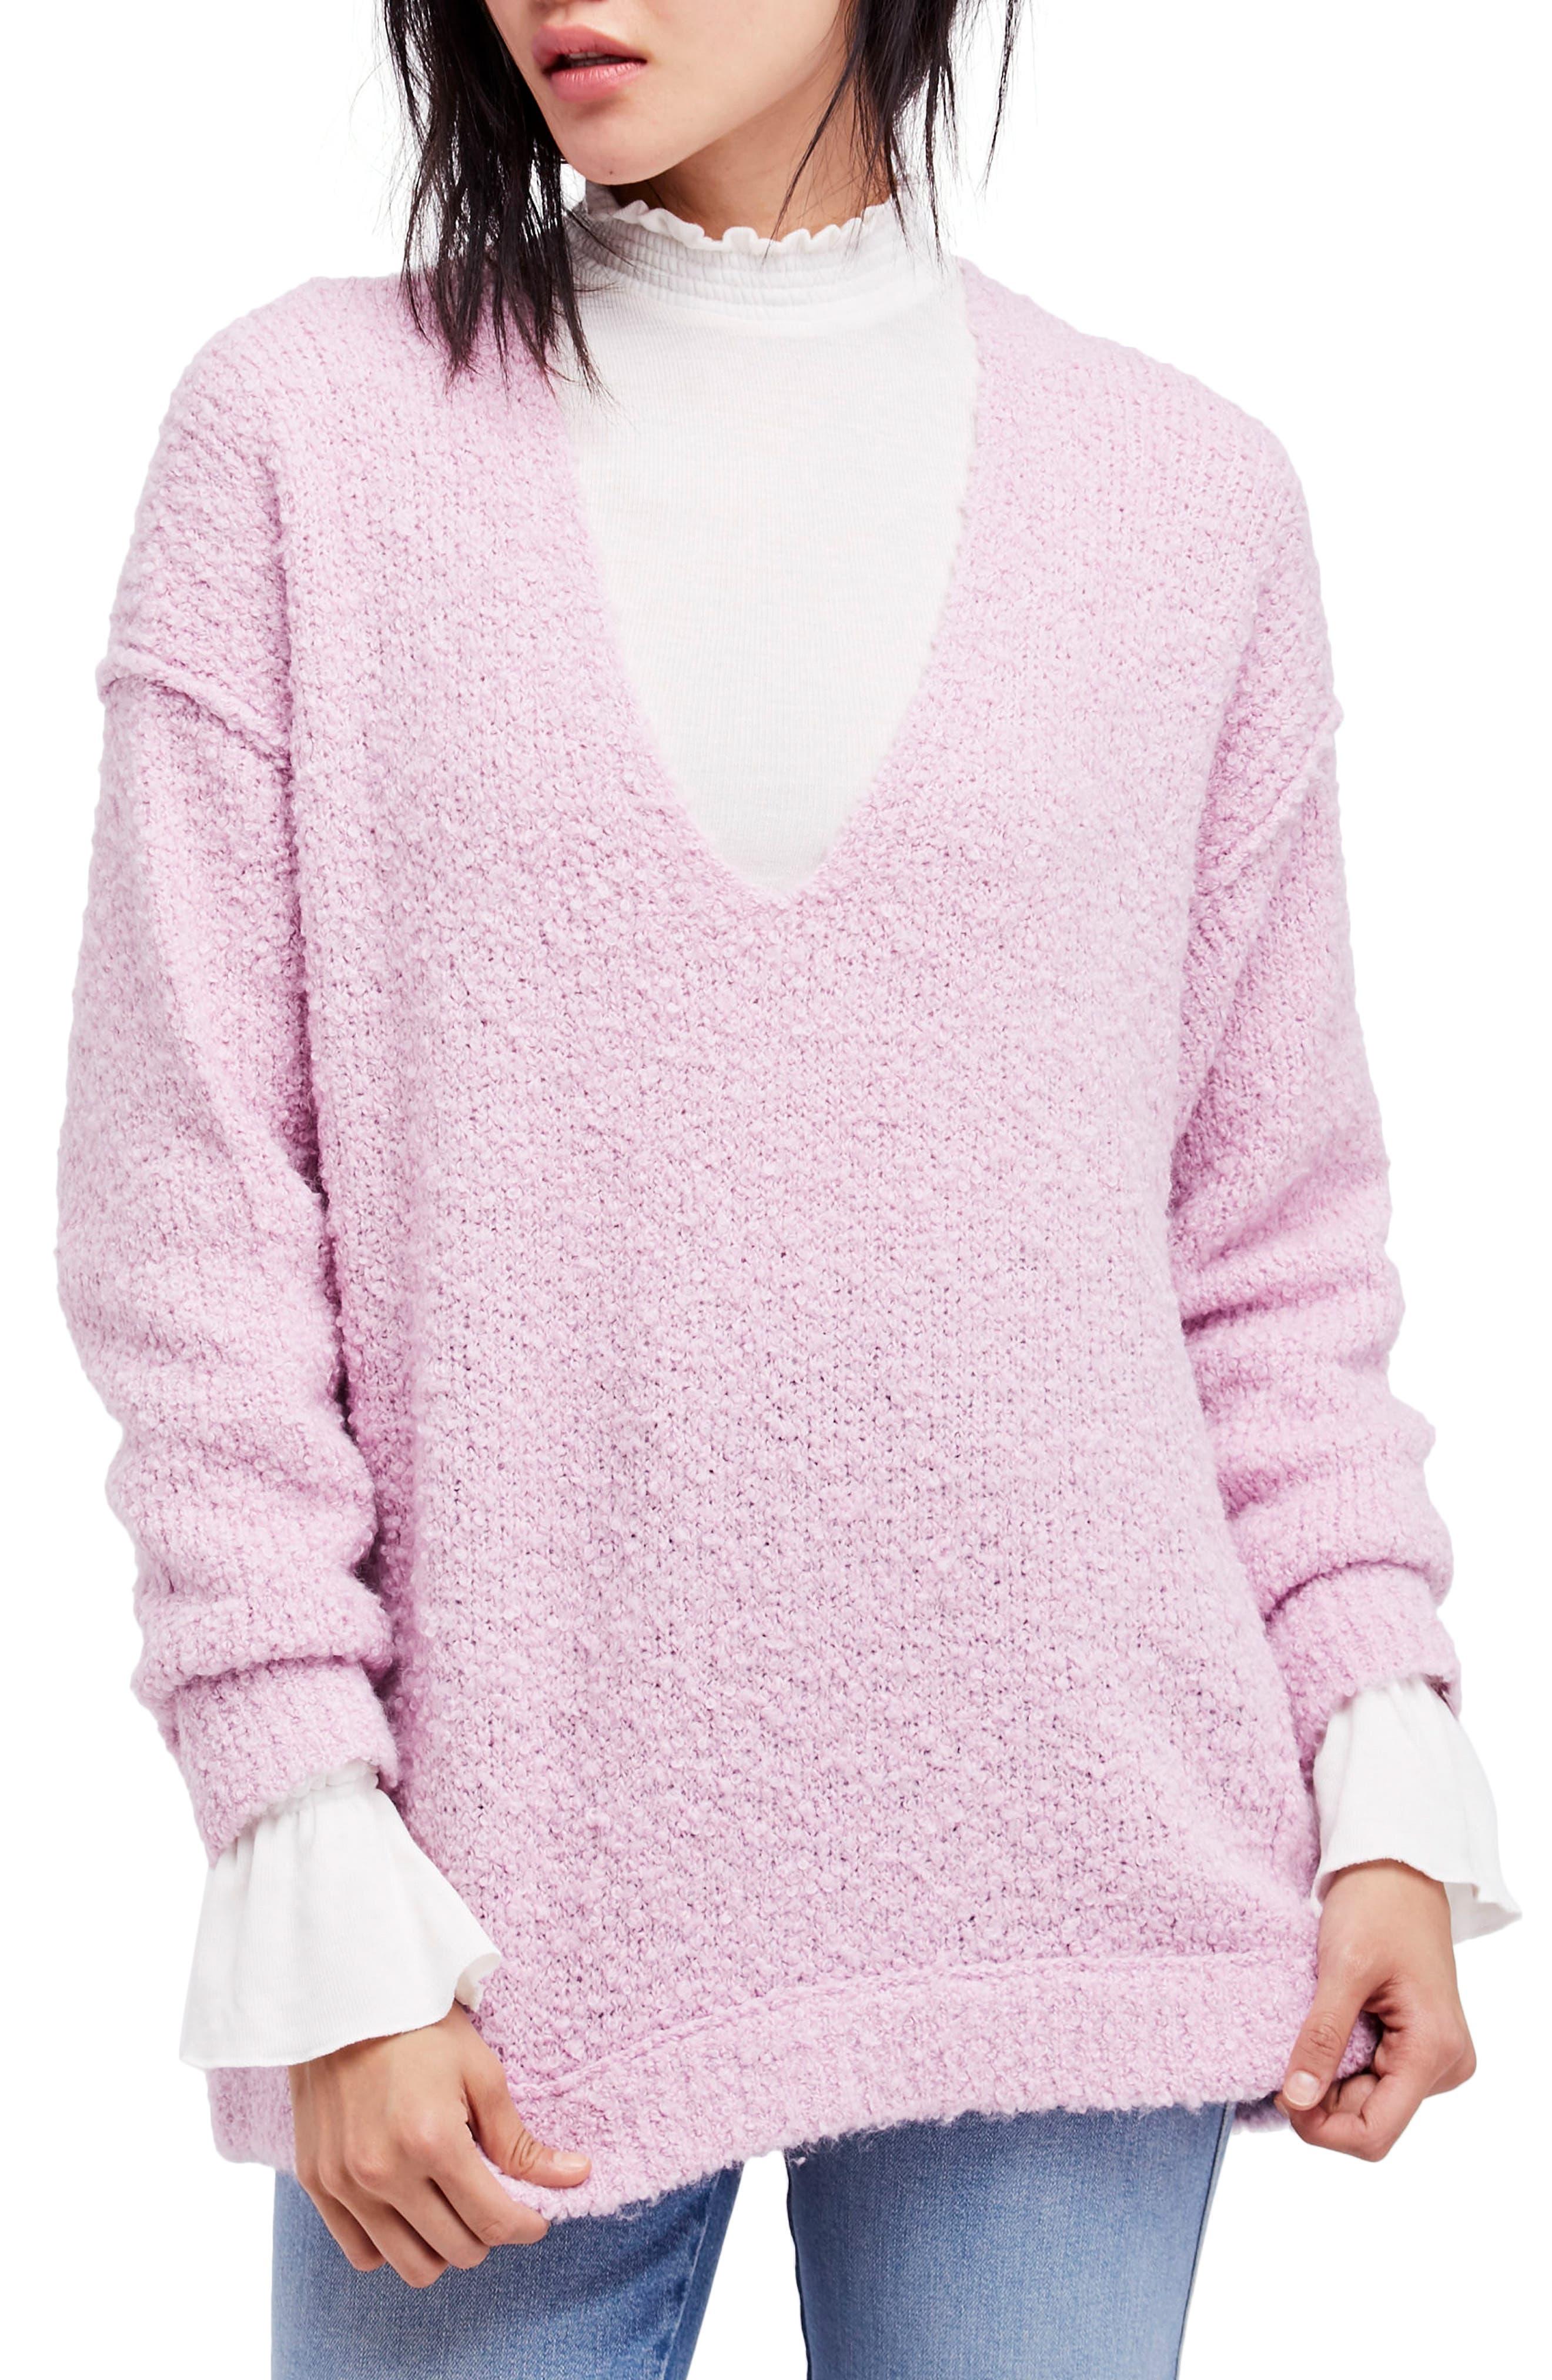 Main Image - Free People Lofty V-Neck Sweater